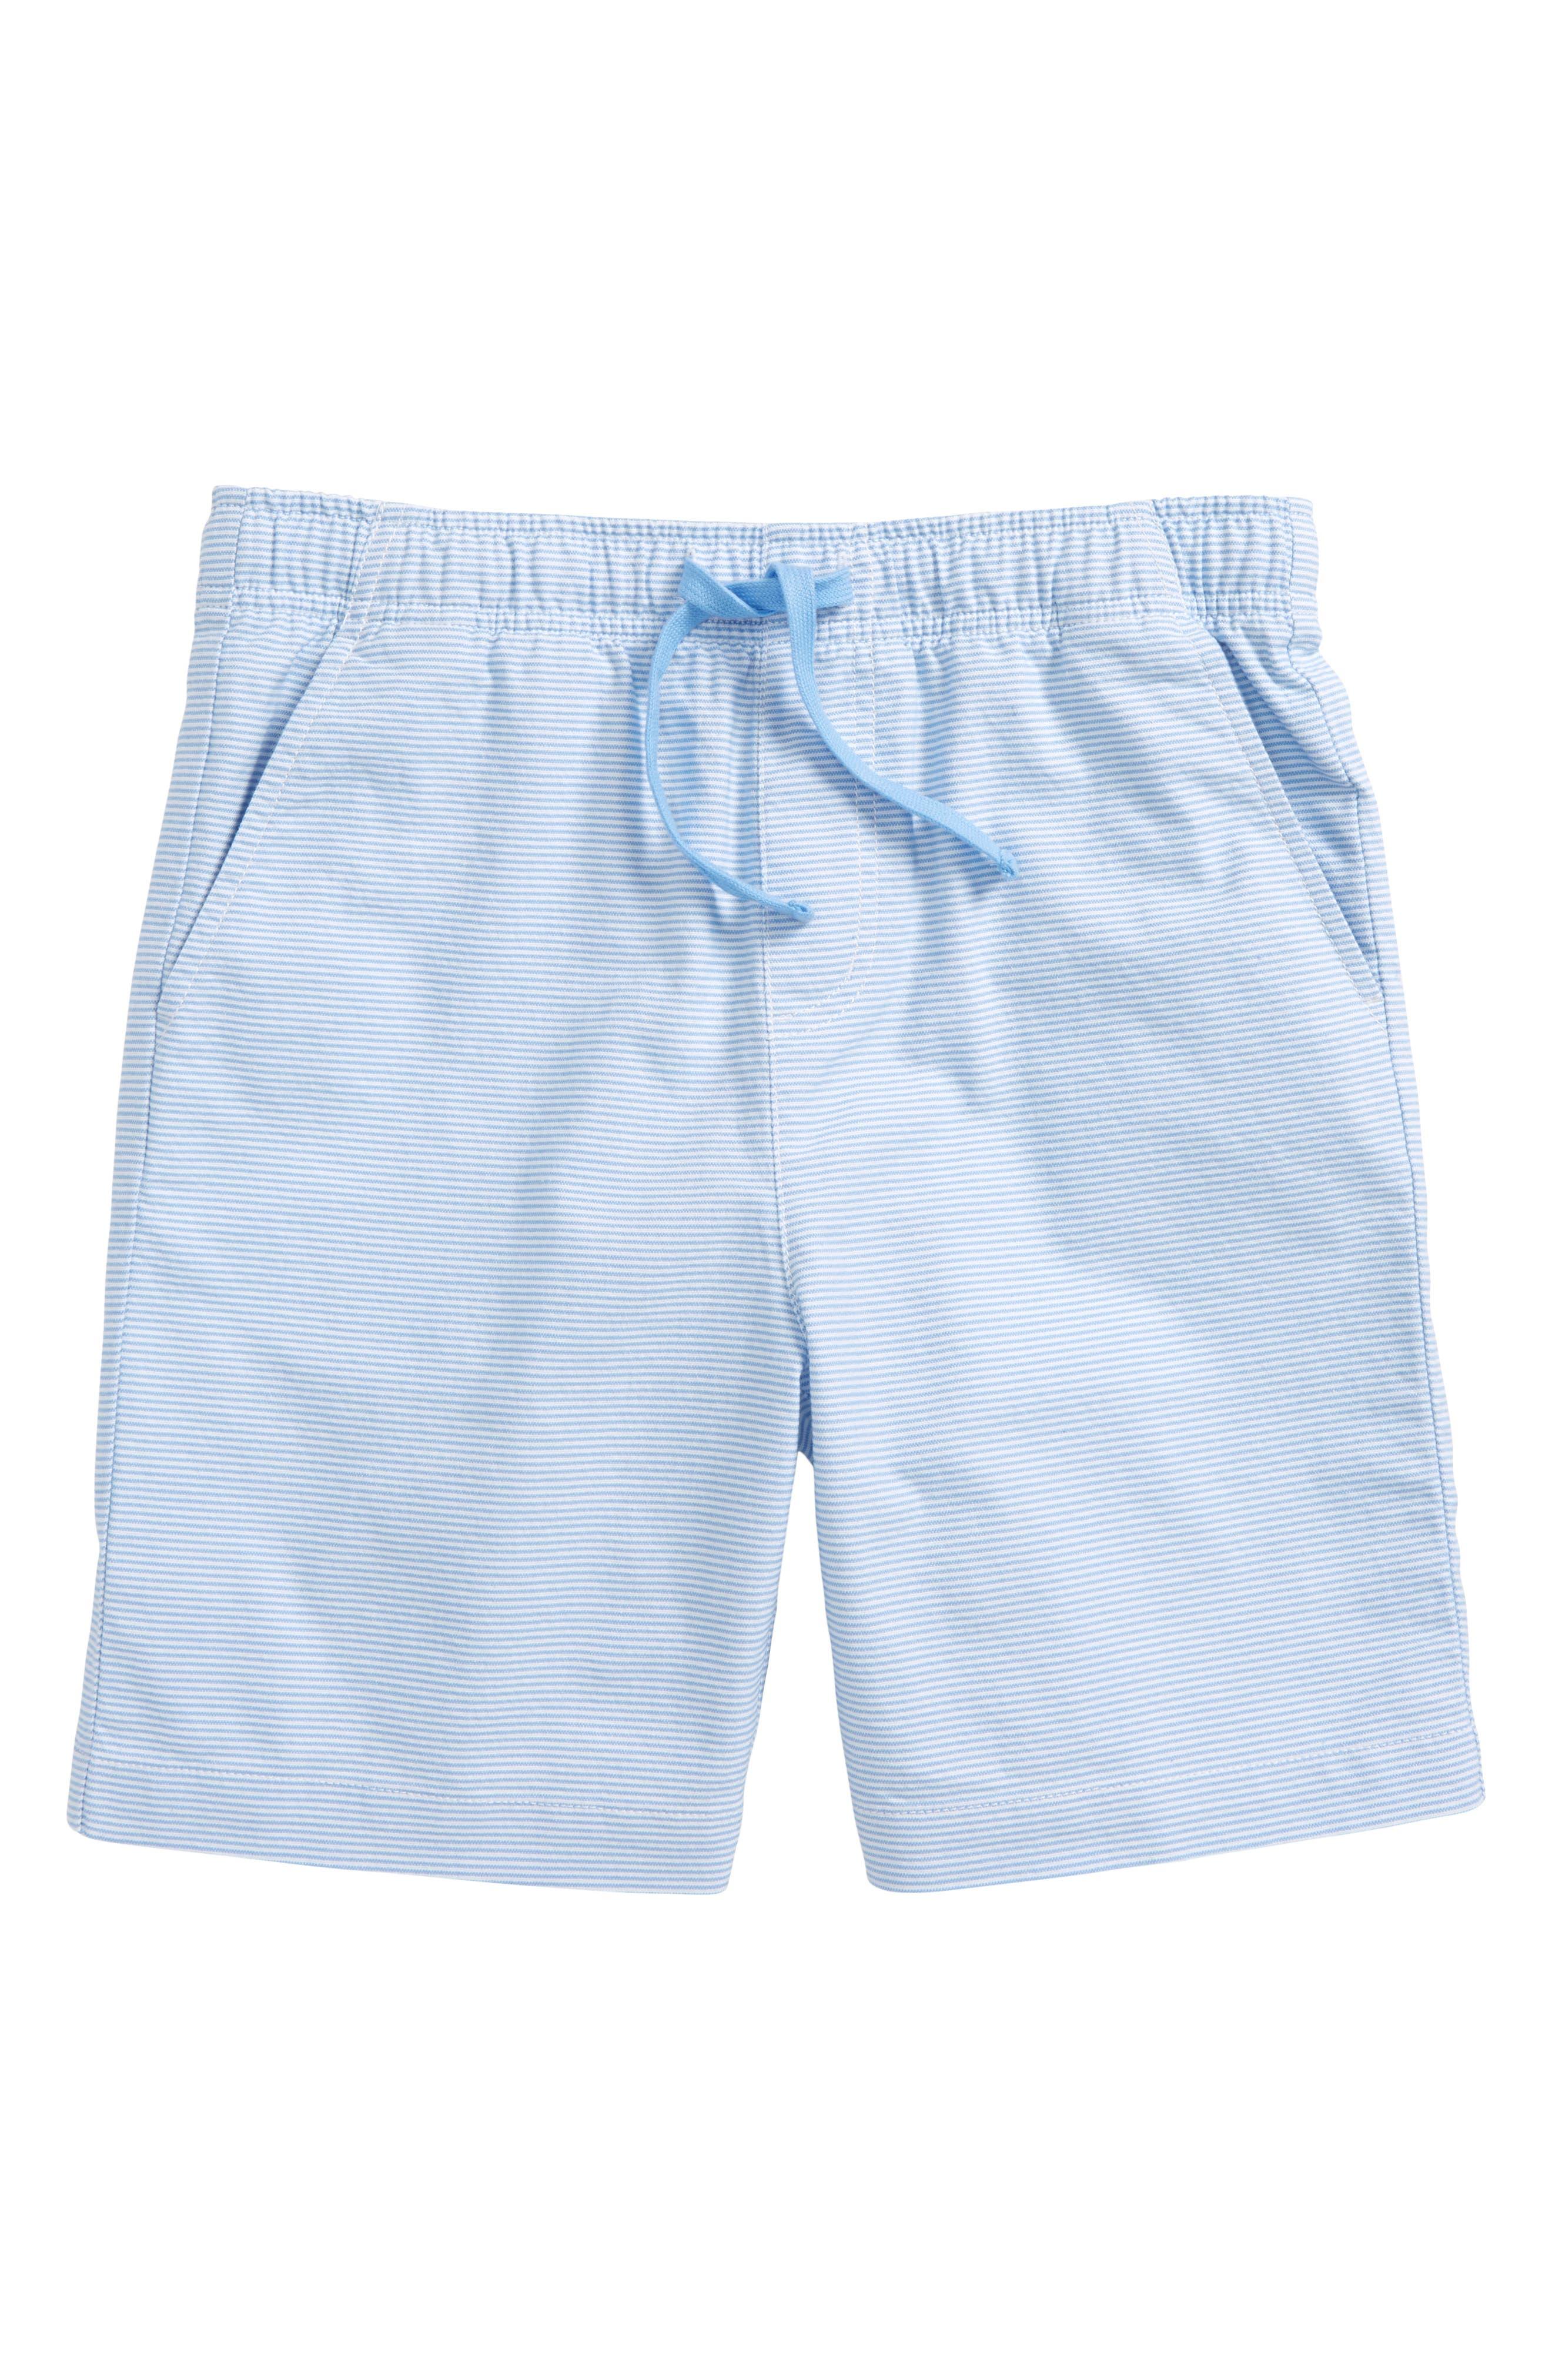 Oxford Stripe Shorts,                         Main,                         color, 484